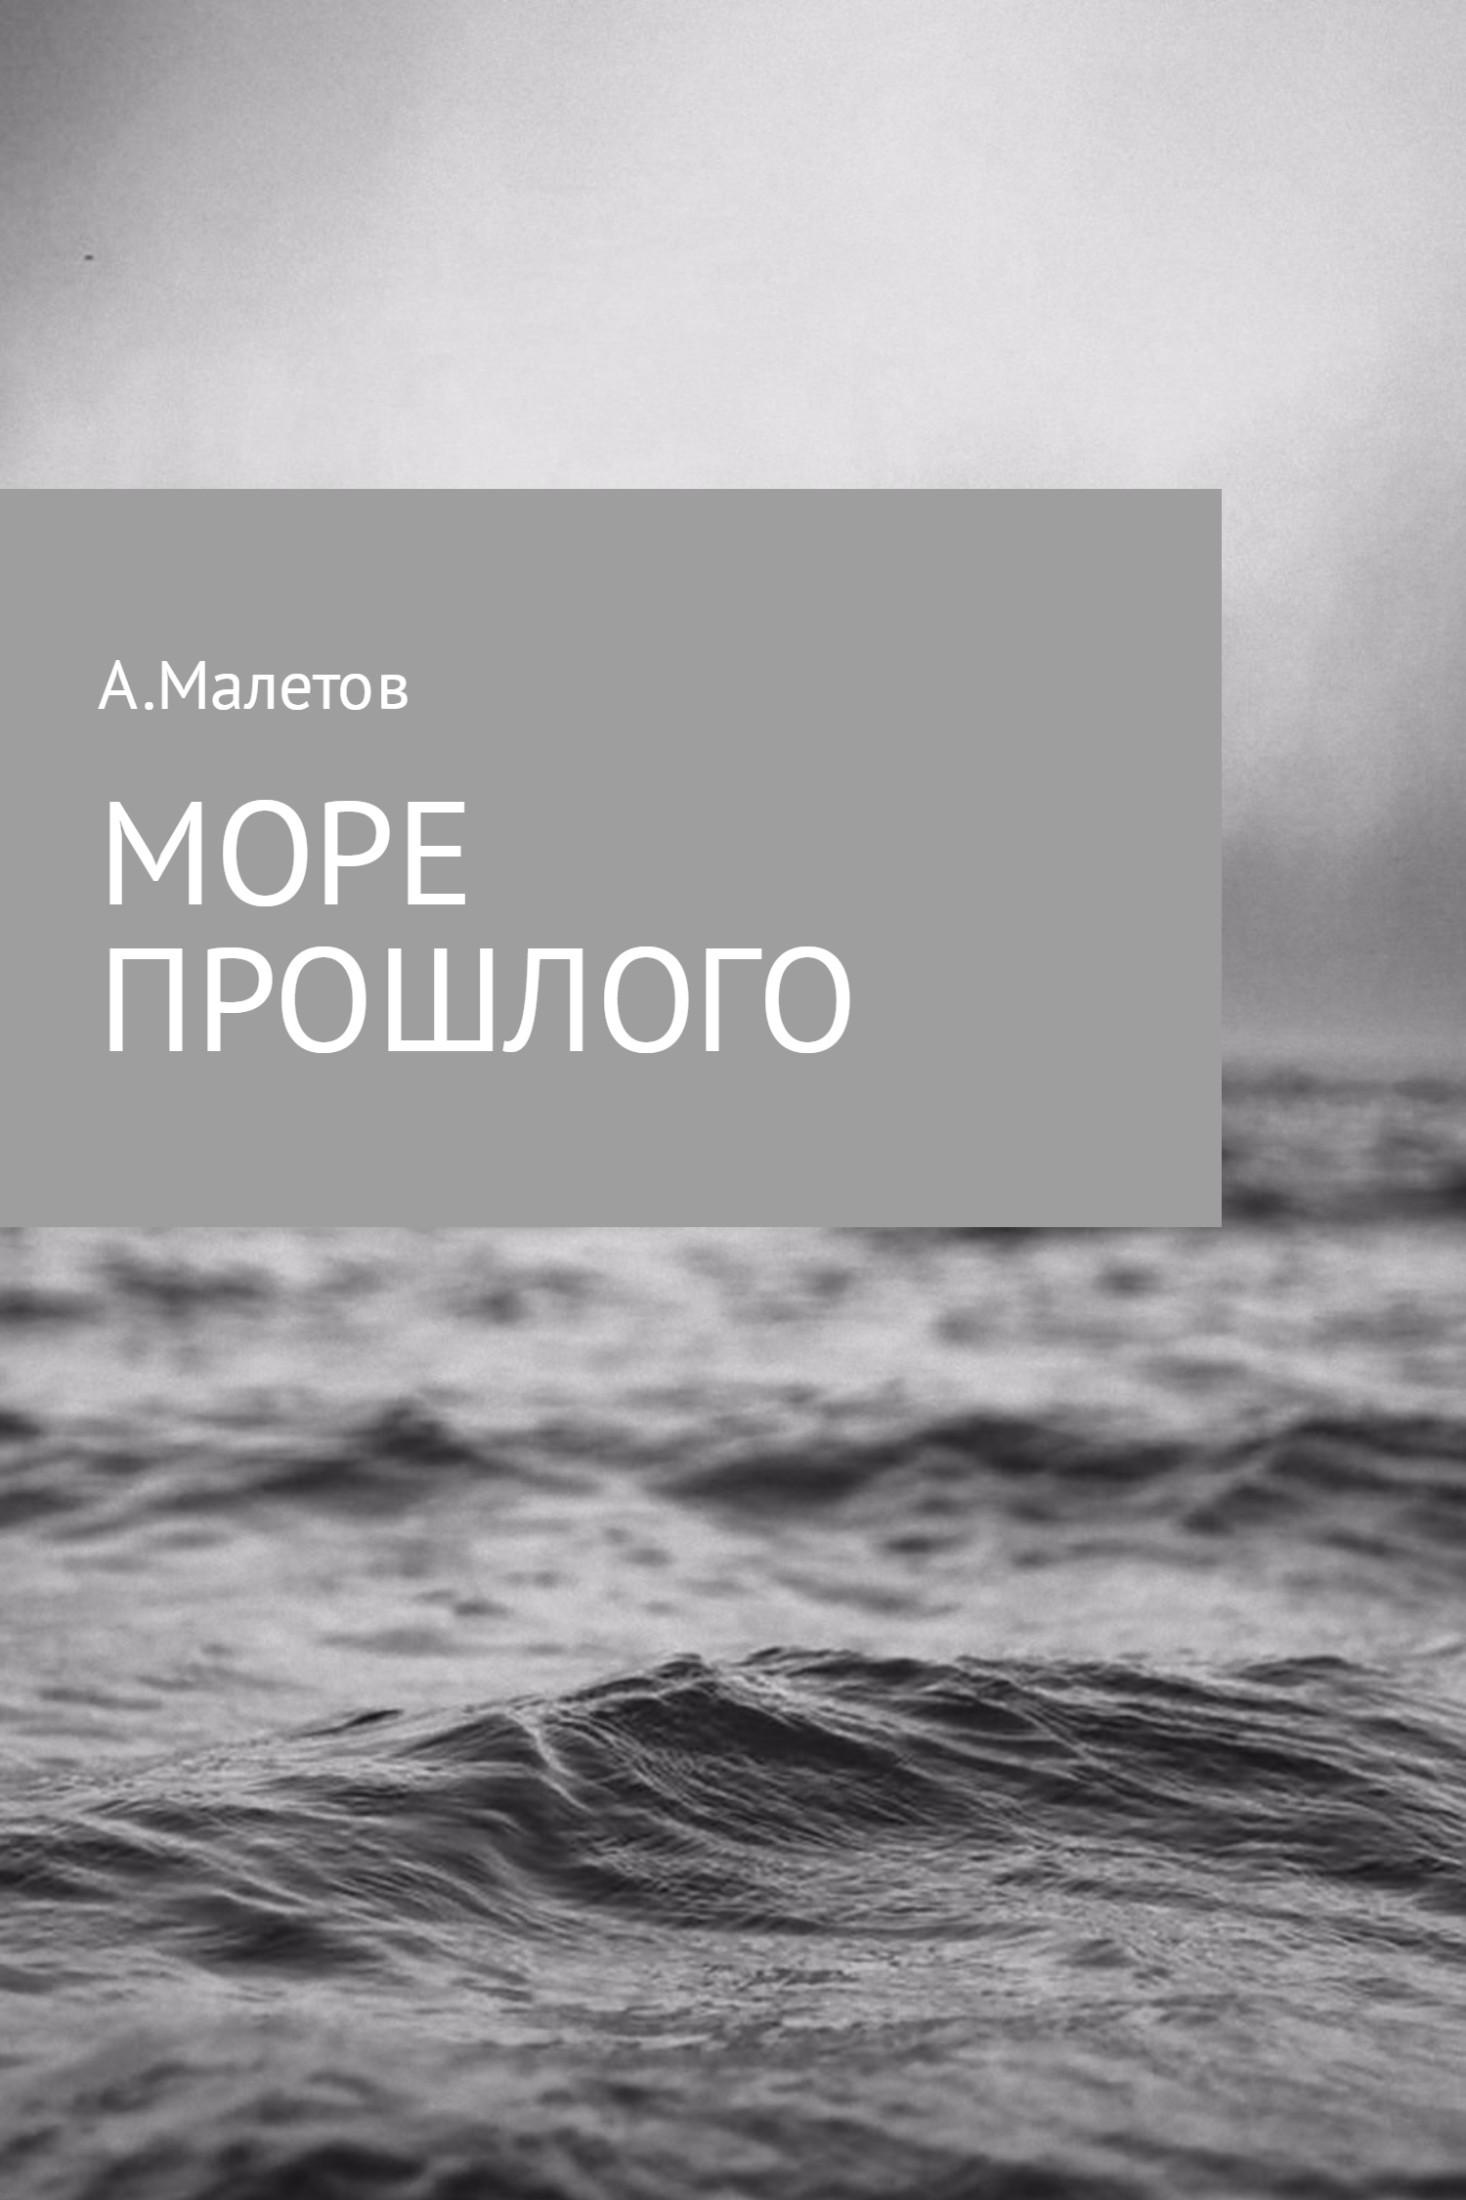 Море прошлого